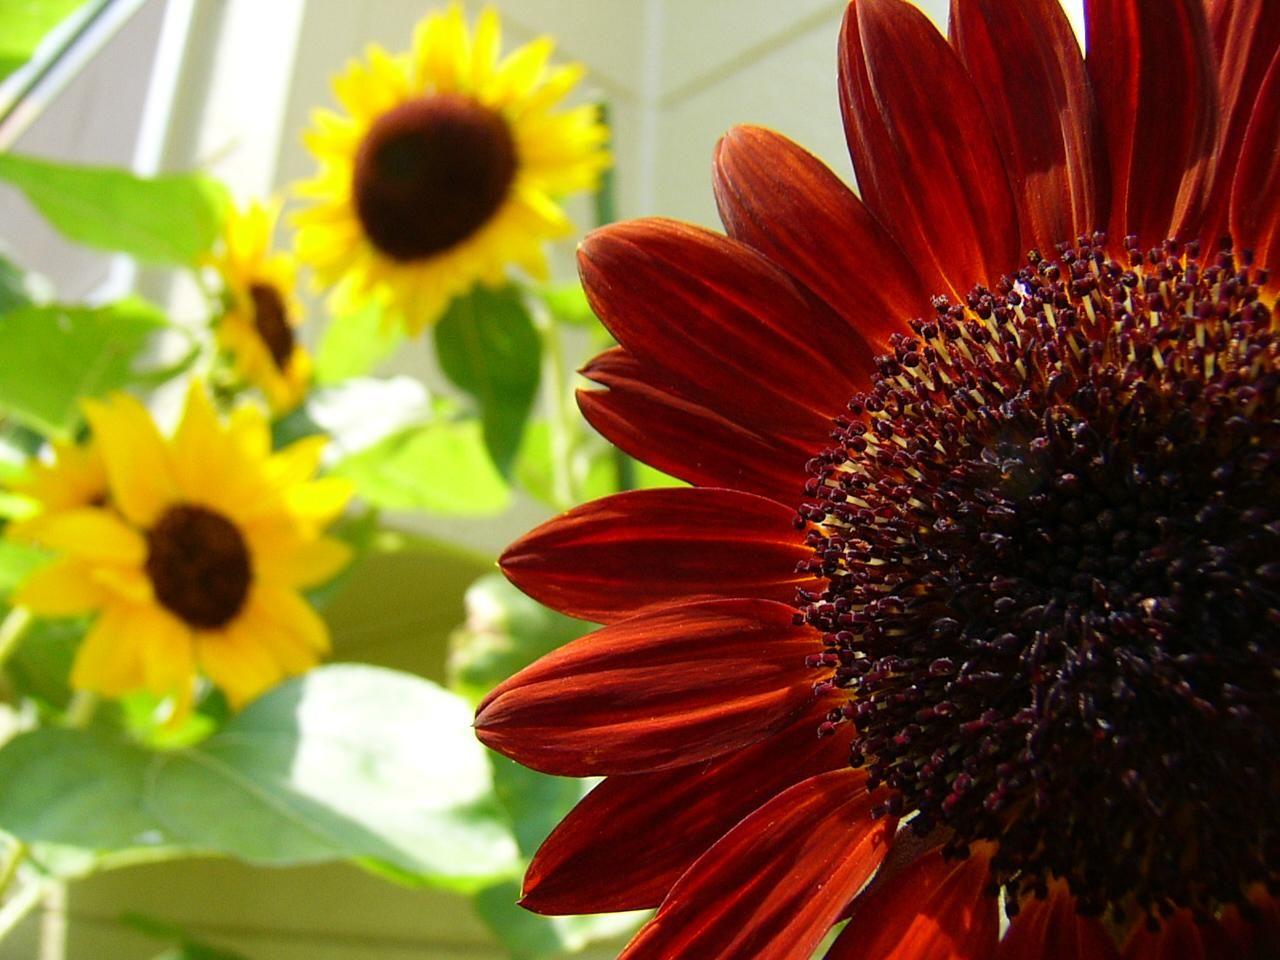 Red Sunflower Wallpaper Red Sunflowers Sunflower Wallpaper Flower Wallpaper